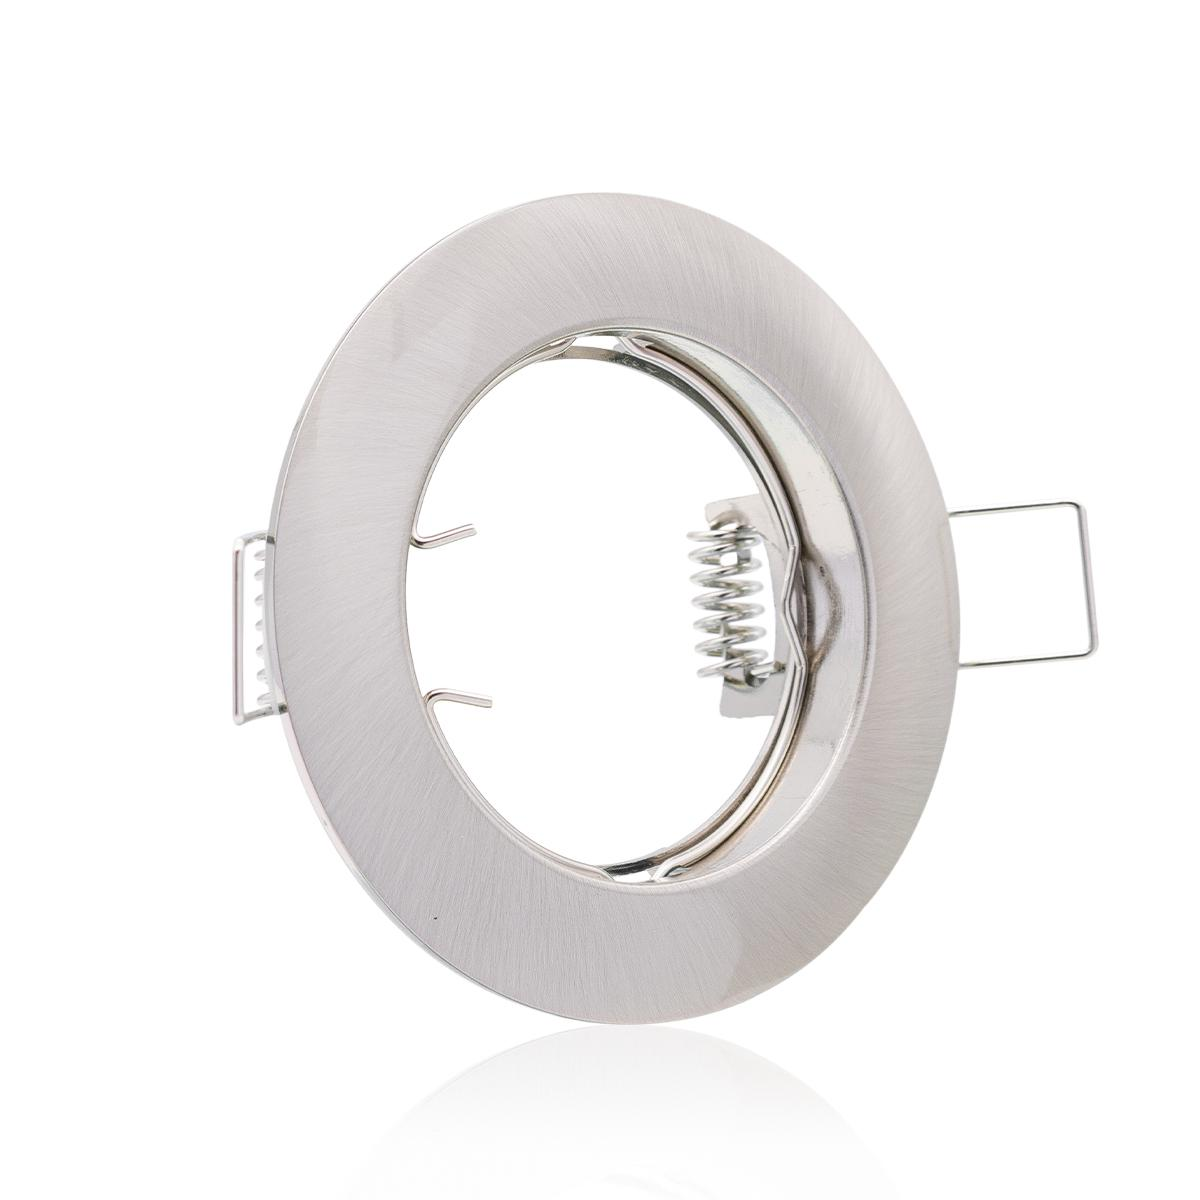 Einbaustrahler  Rahmen rund Edelstahl gebürstet Optik starr Ring Decken Spot Sprengring